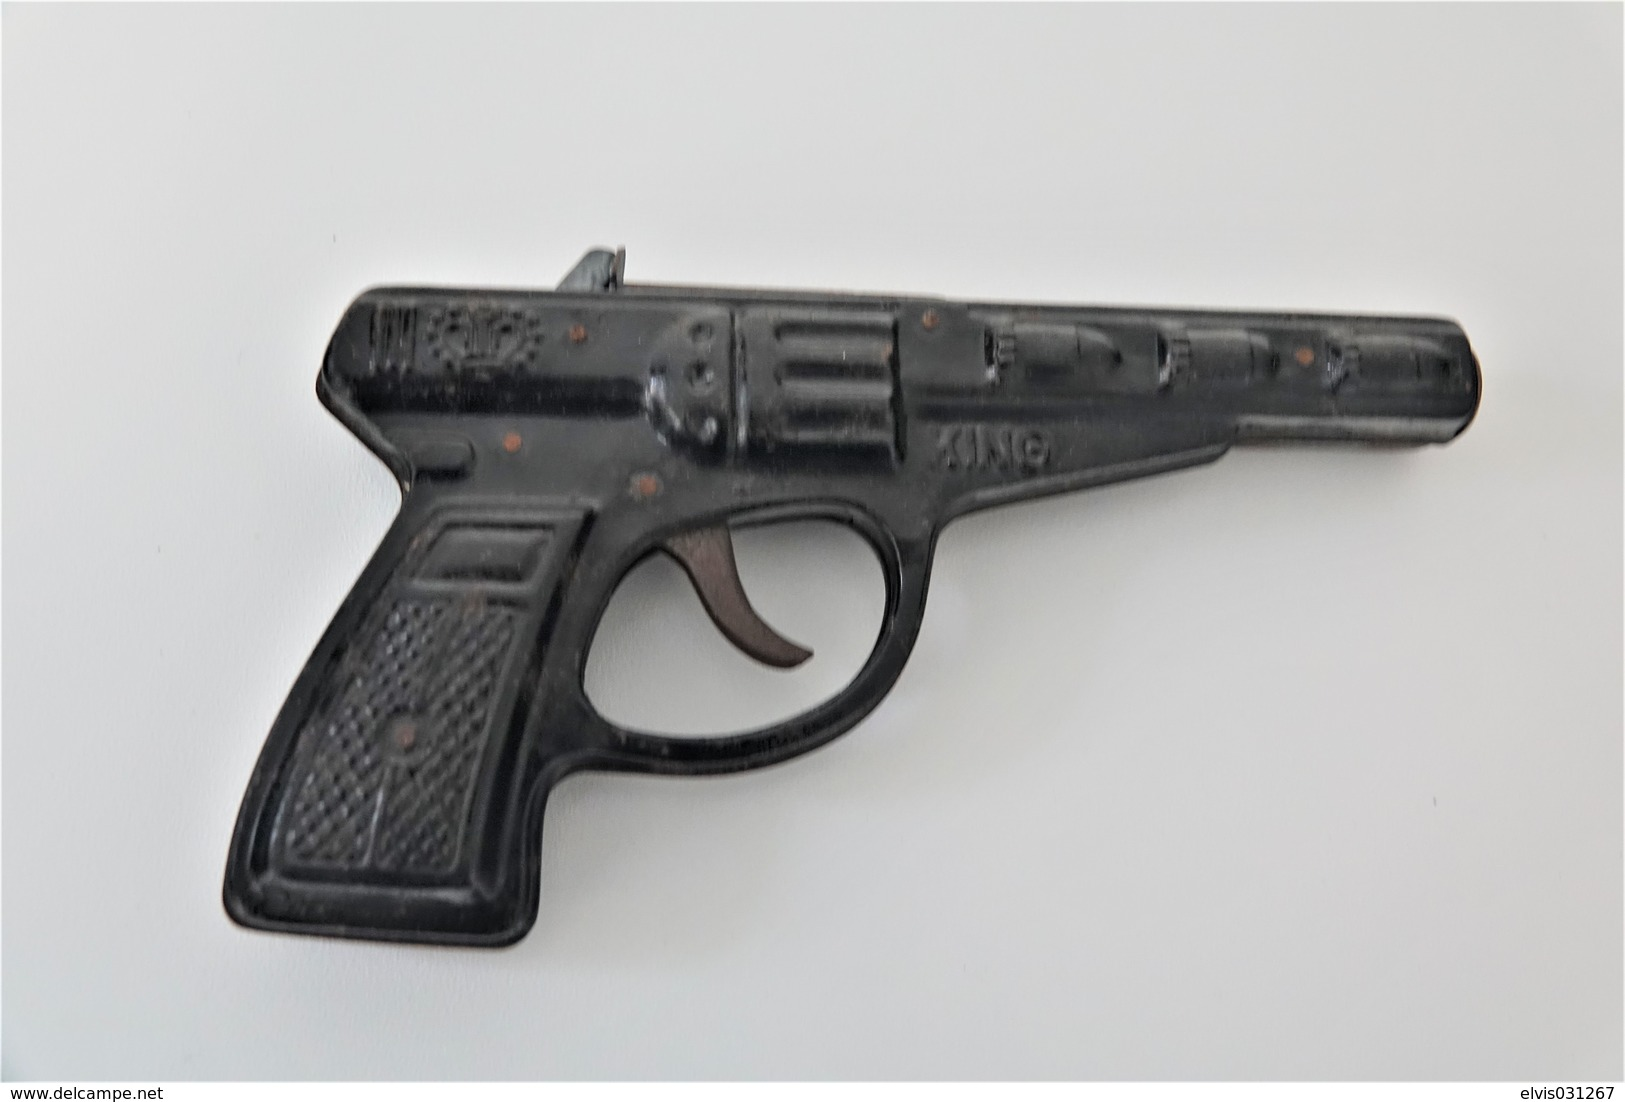 Vintage TOY GUN : TIN TOY KING GUN With EMAIL PIECE - L=19.0cm - 1950s  - Keywords : Cap - Rifle - Revolver - Pistol - Decotatieve Wapens